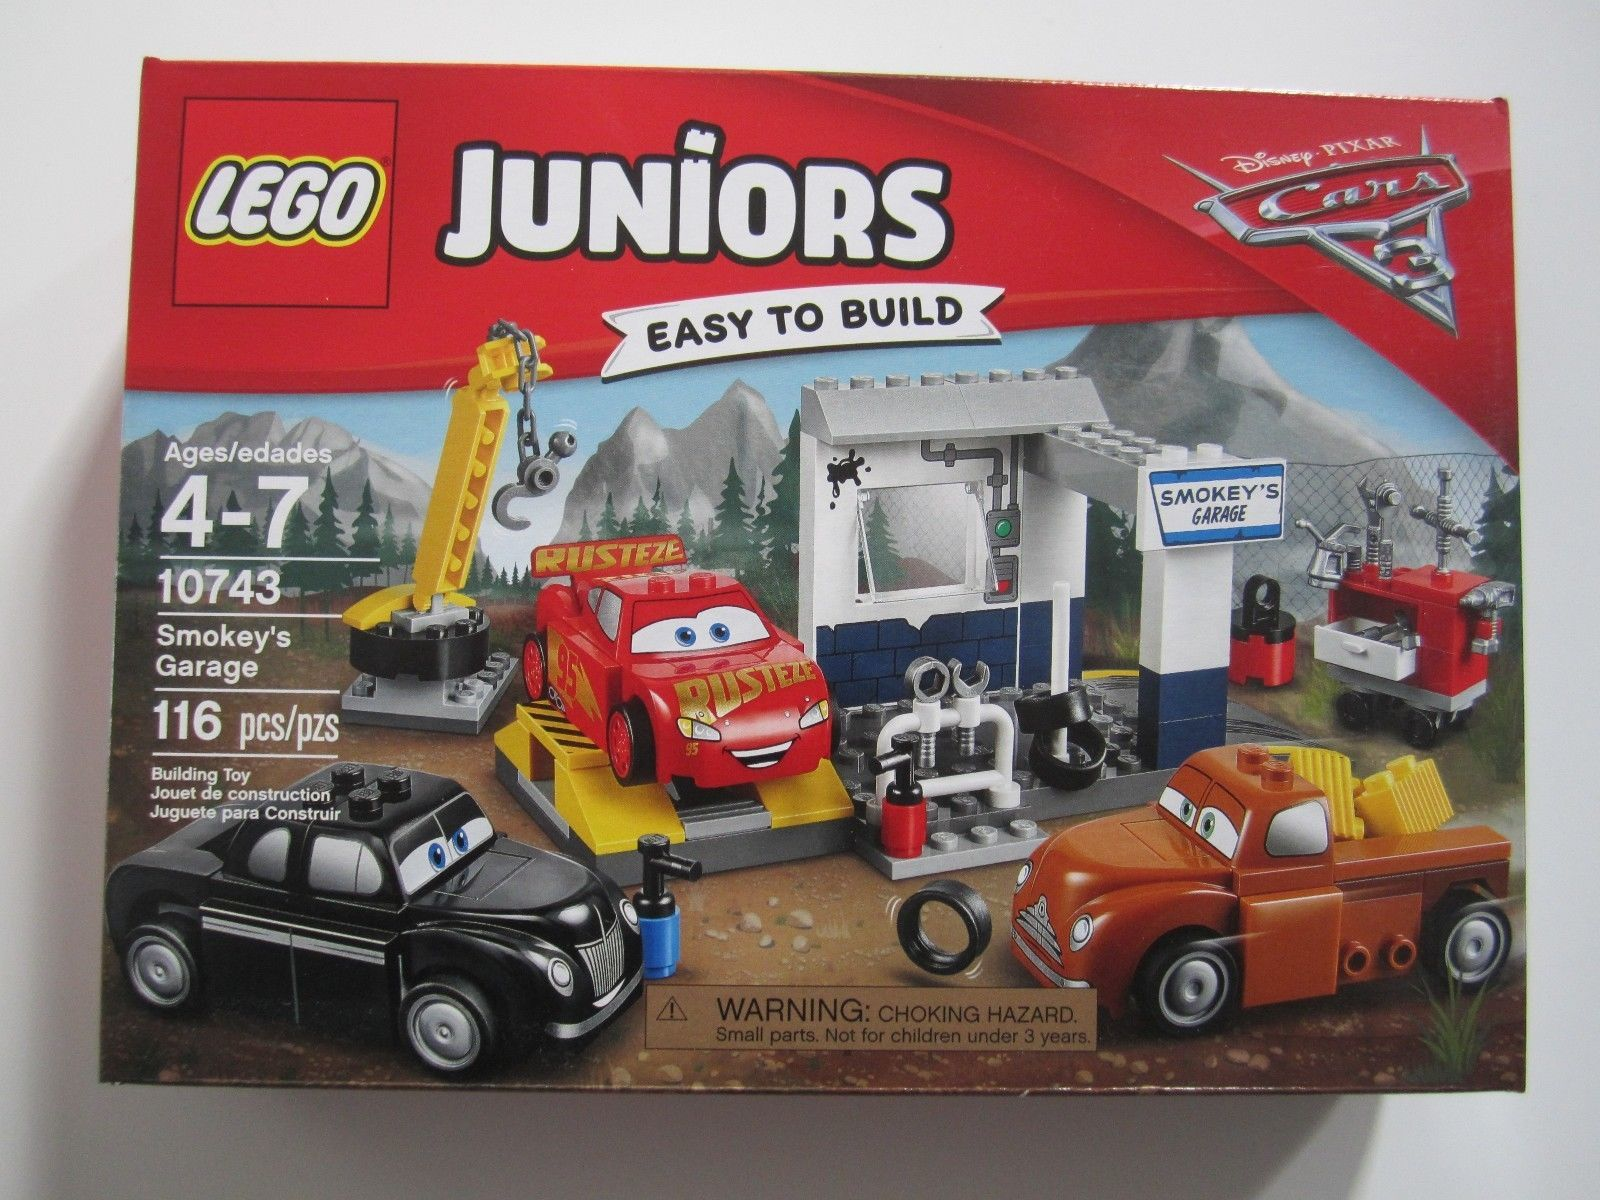 10672 Lego Juniors Disney Pixar Cars 3 Smokey S Garage 116 Pieces